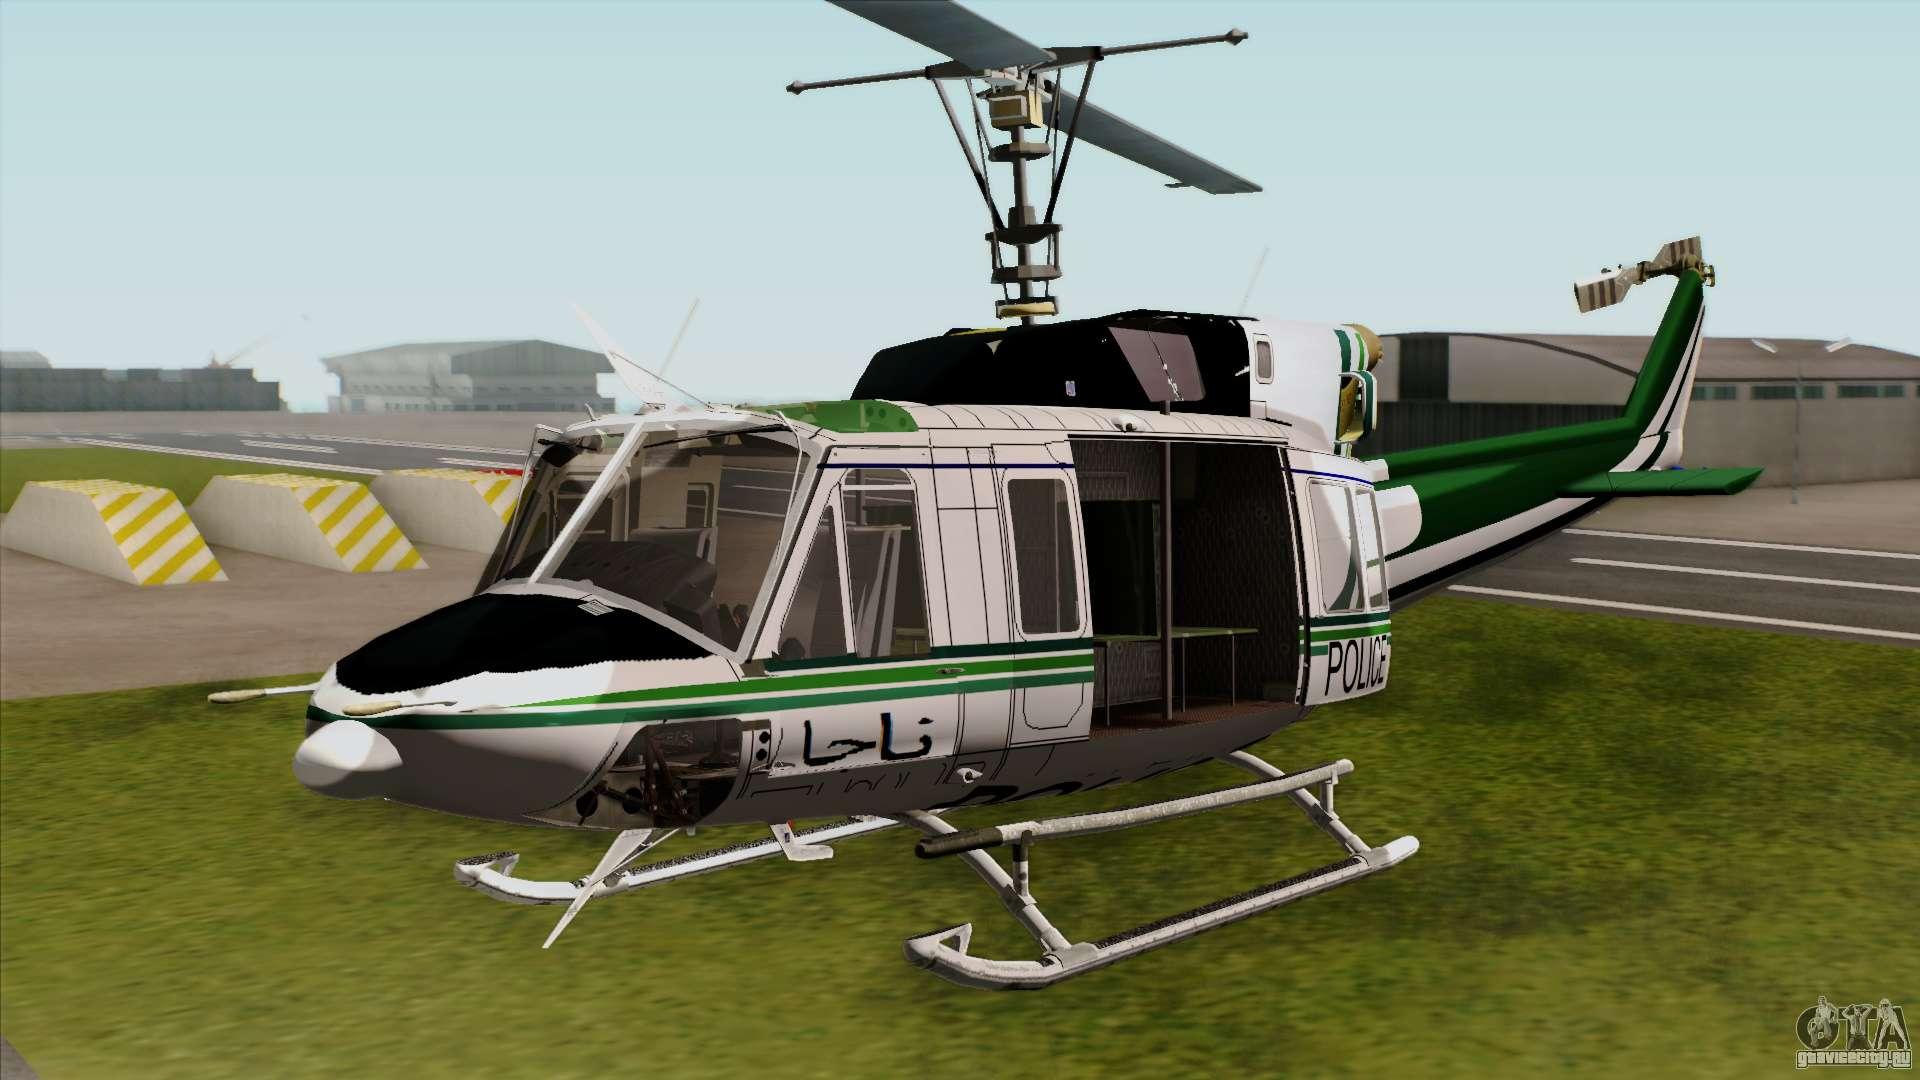 Обои AB-212, Agusta-Bell, транспортный вертолёт. Авиация foto 14